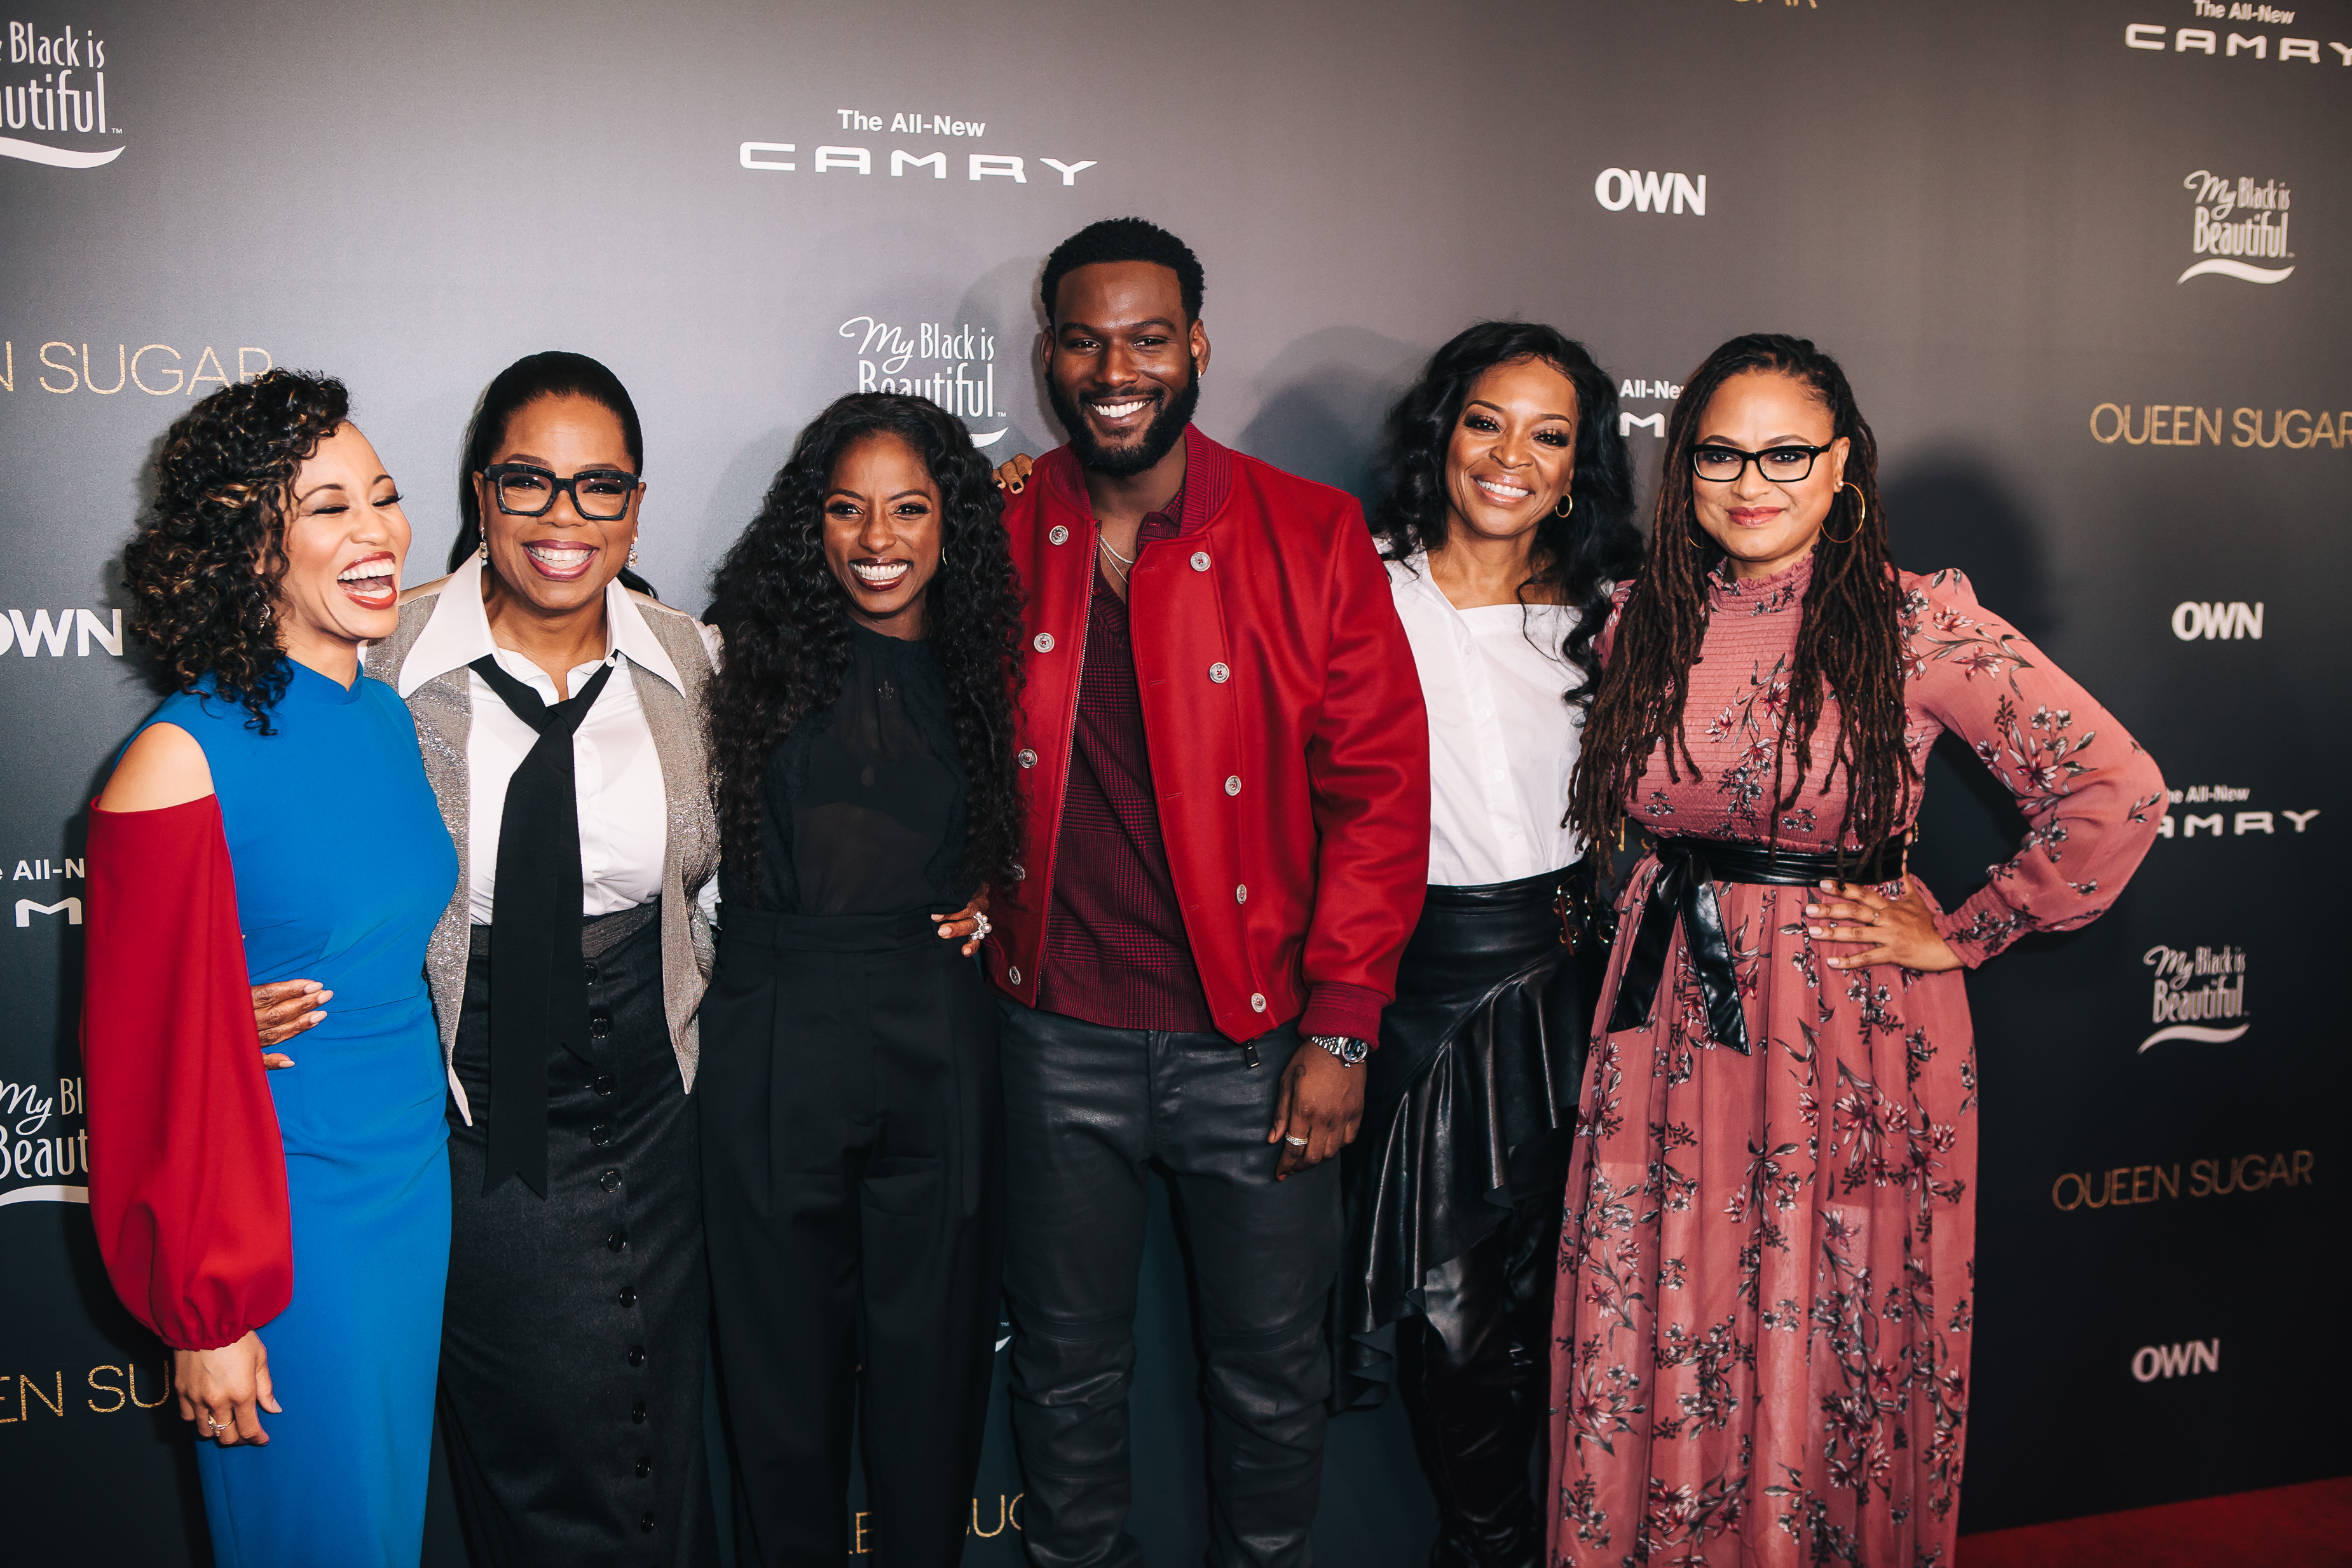 'Queen Sugar' Season 2 Finale Event | Black America Web